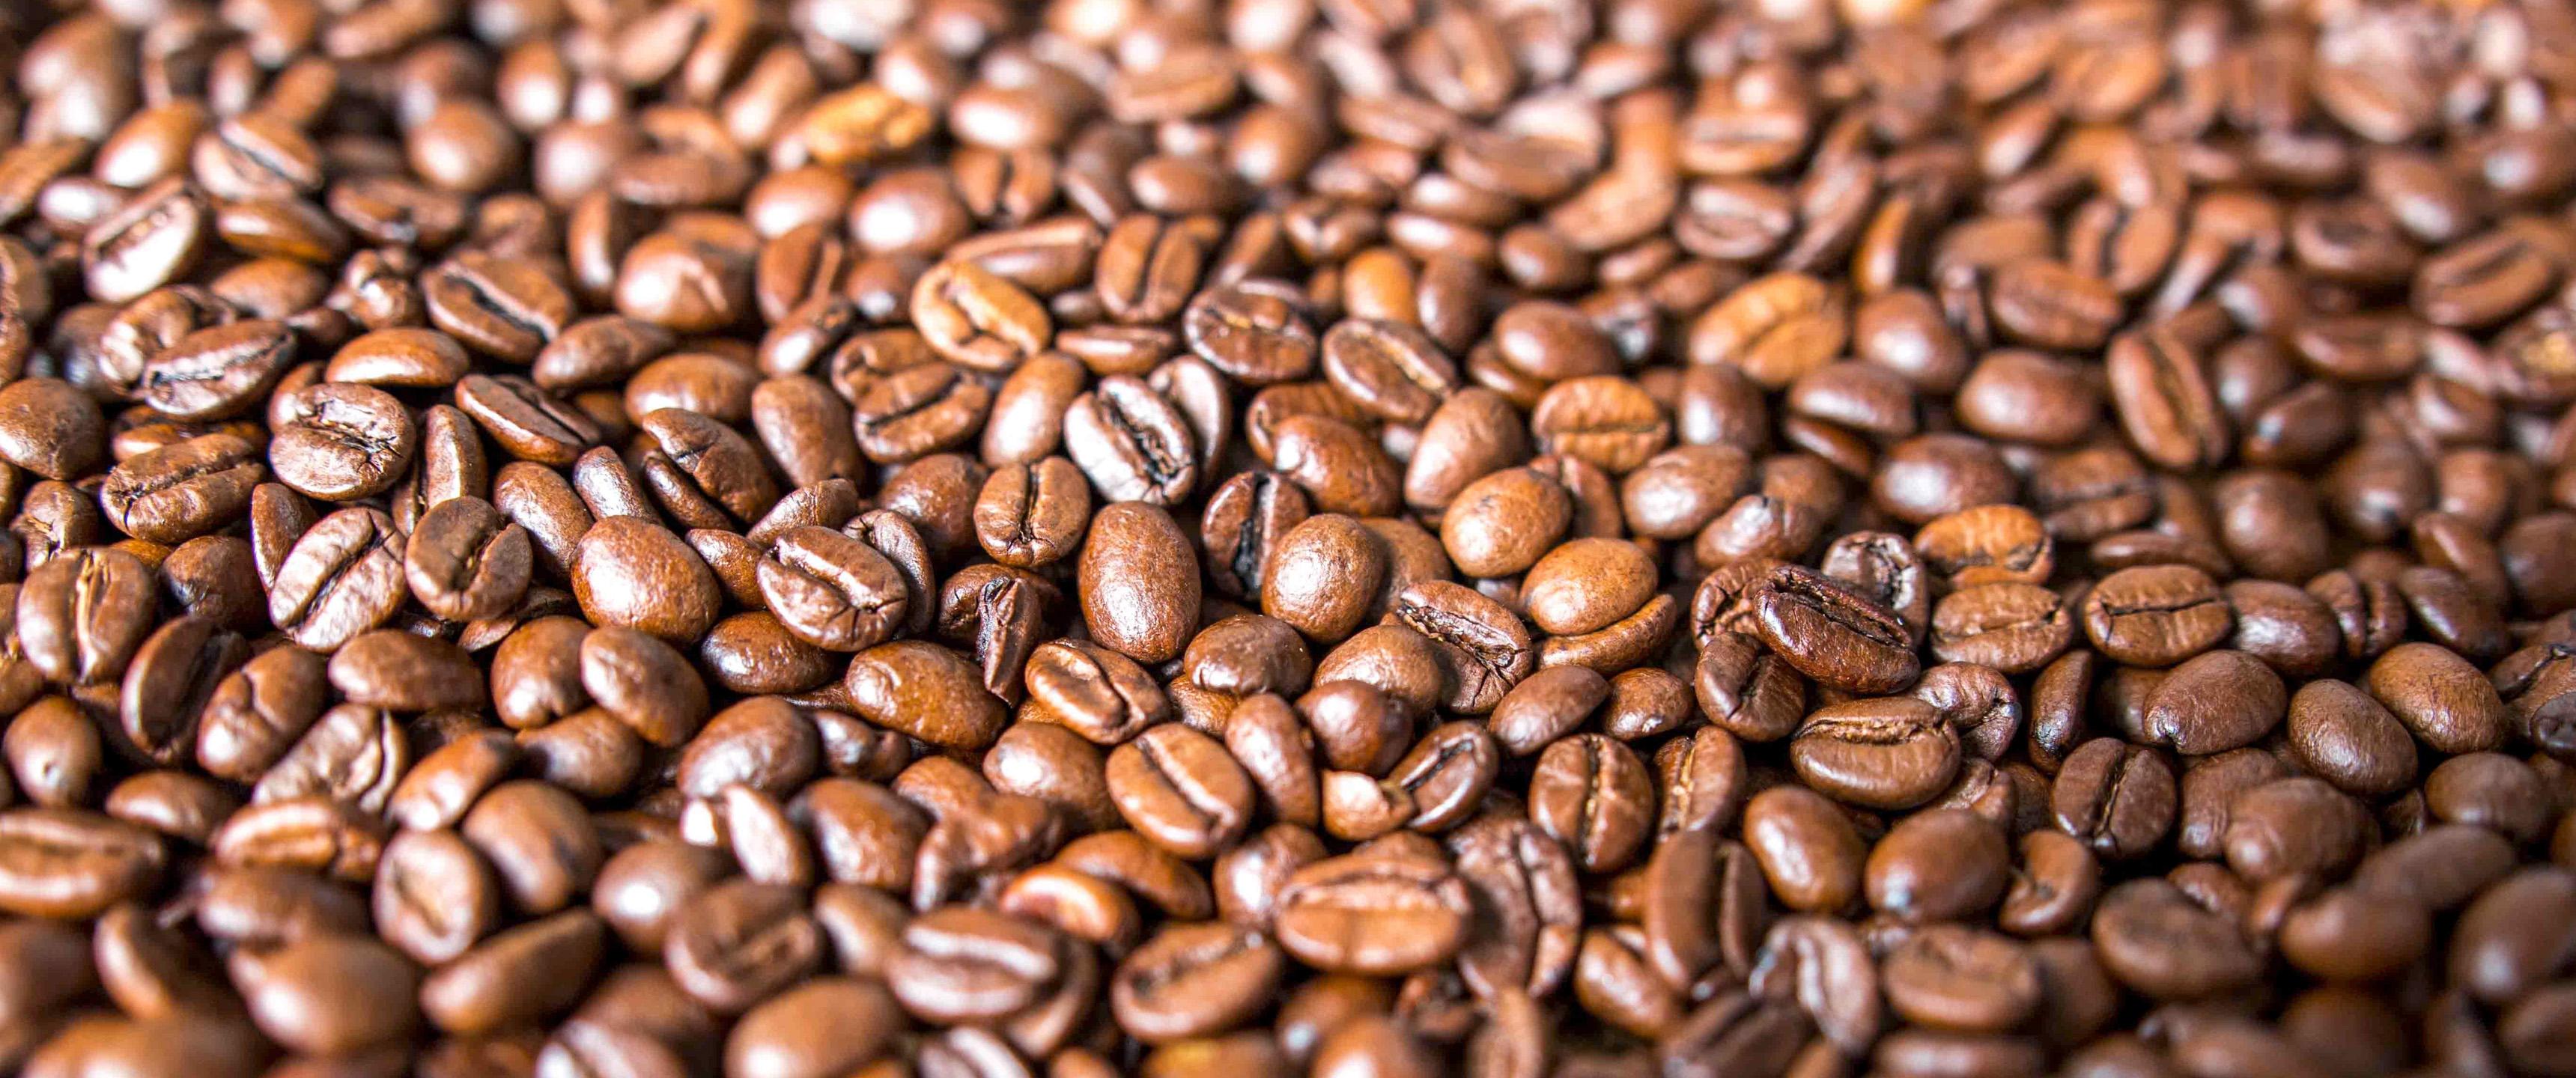 Coffee Beans 21 9 Wallpaper Ultrawide Monitor 21 9